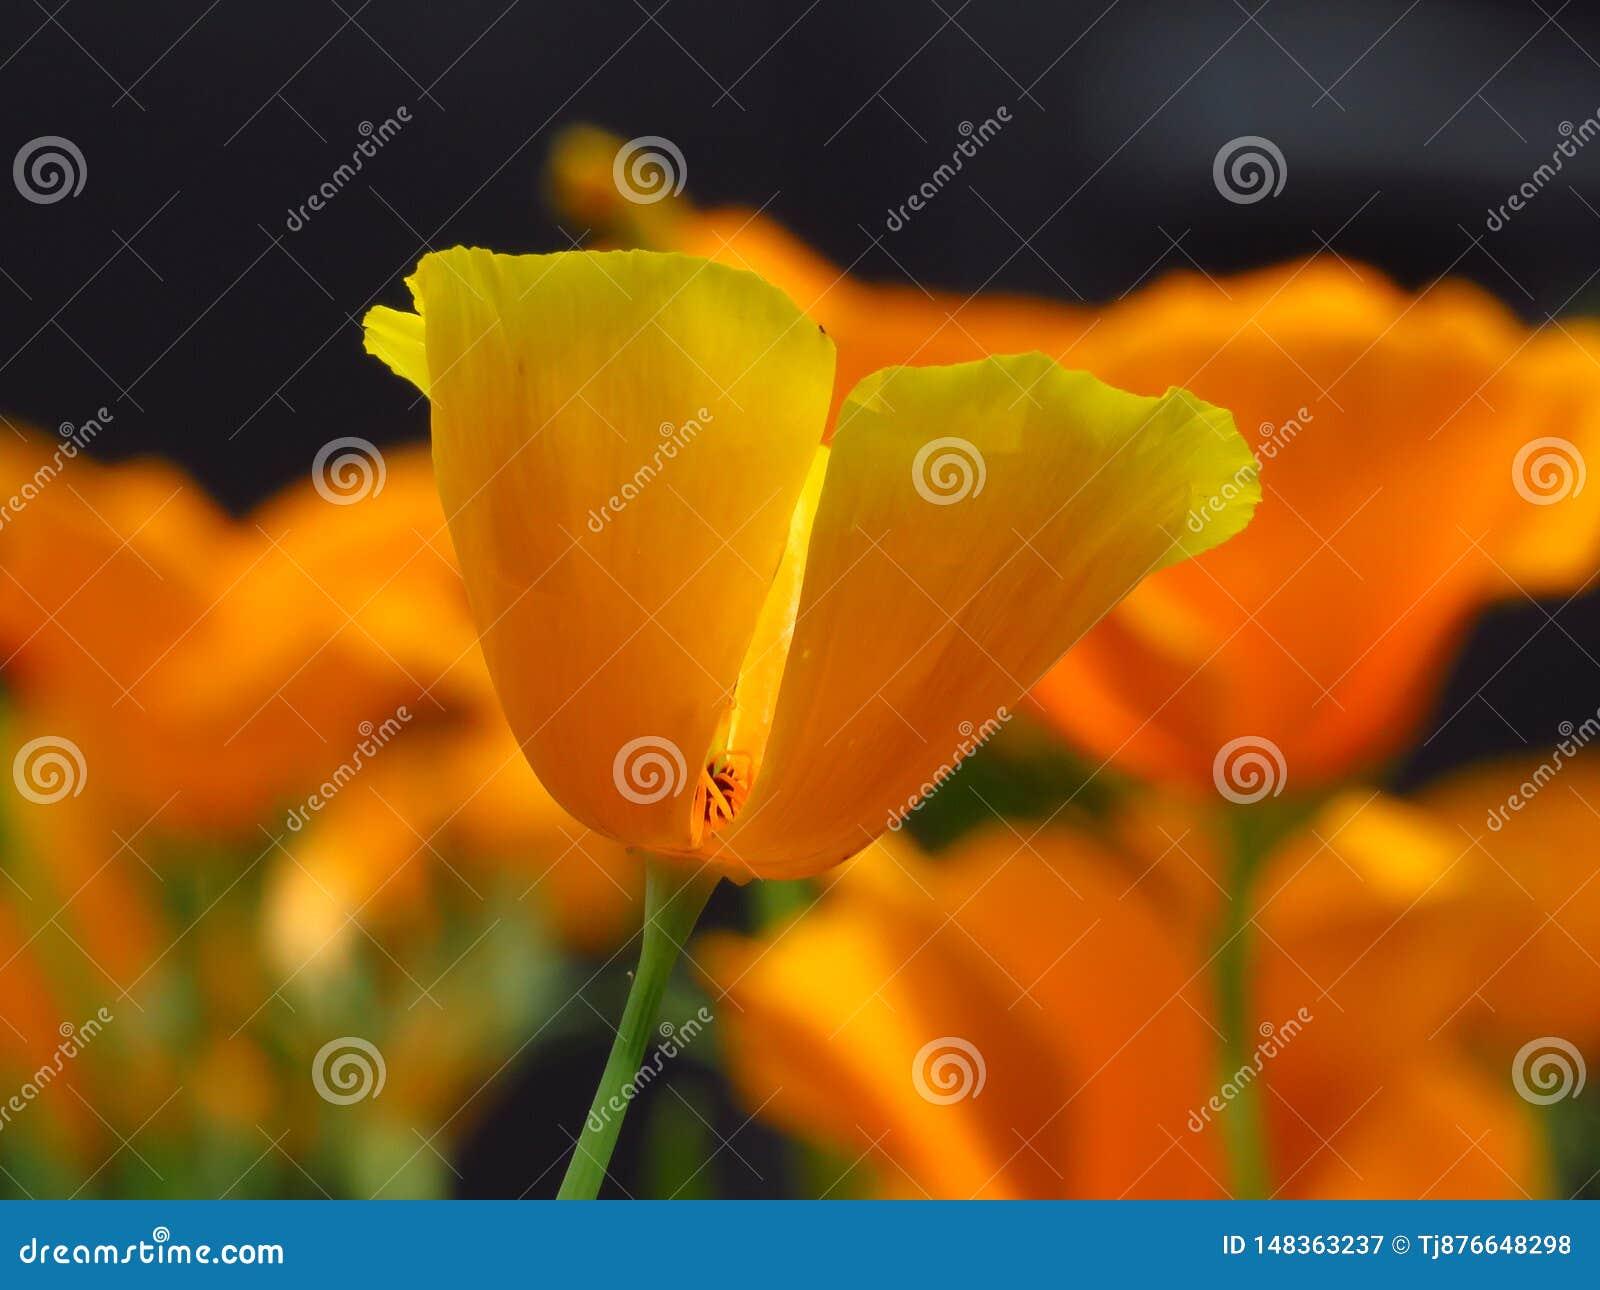 Poppy yellow garden flowers. California Poppy. Orange yellow flower closeup on blurred background.